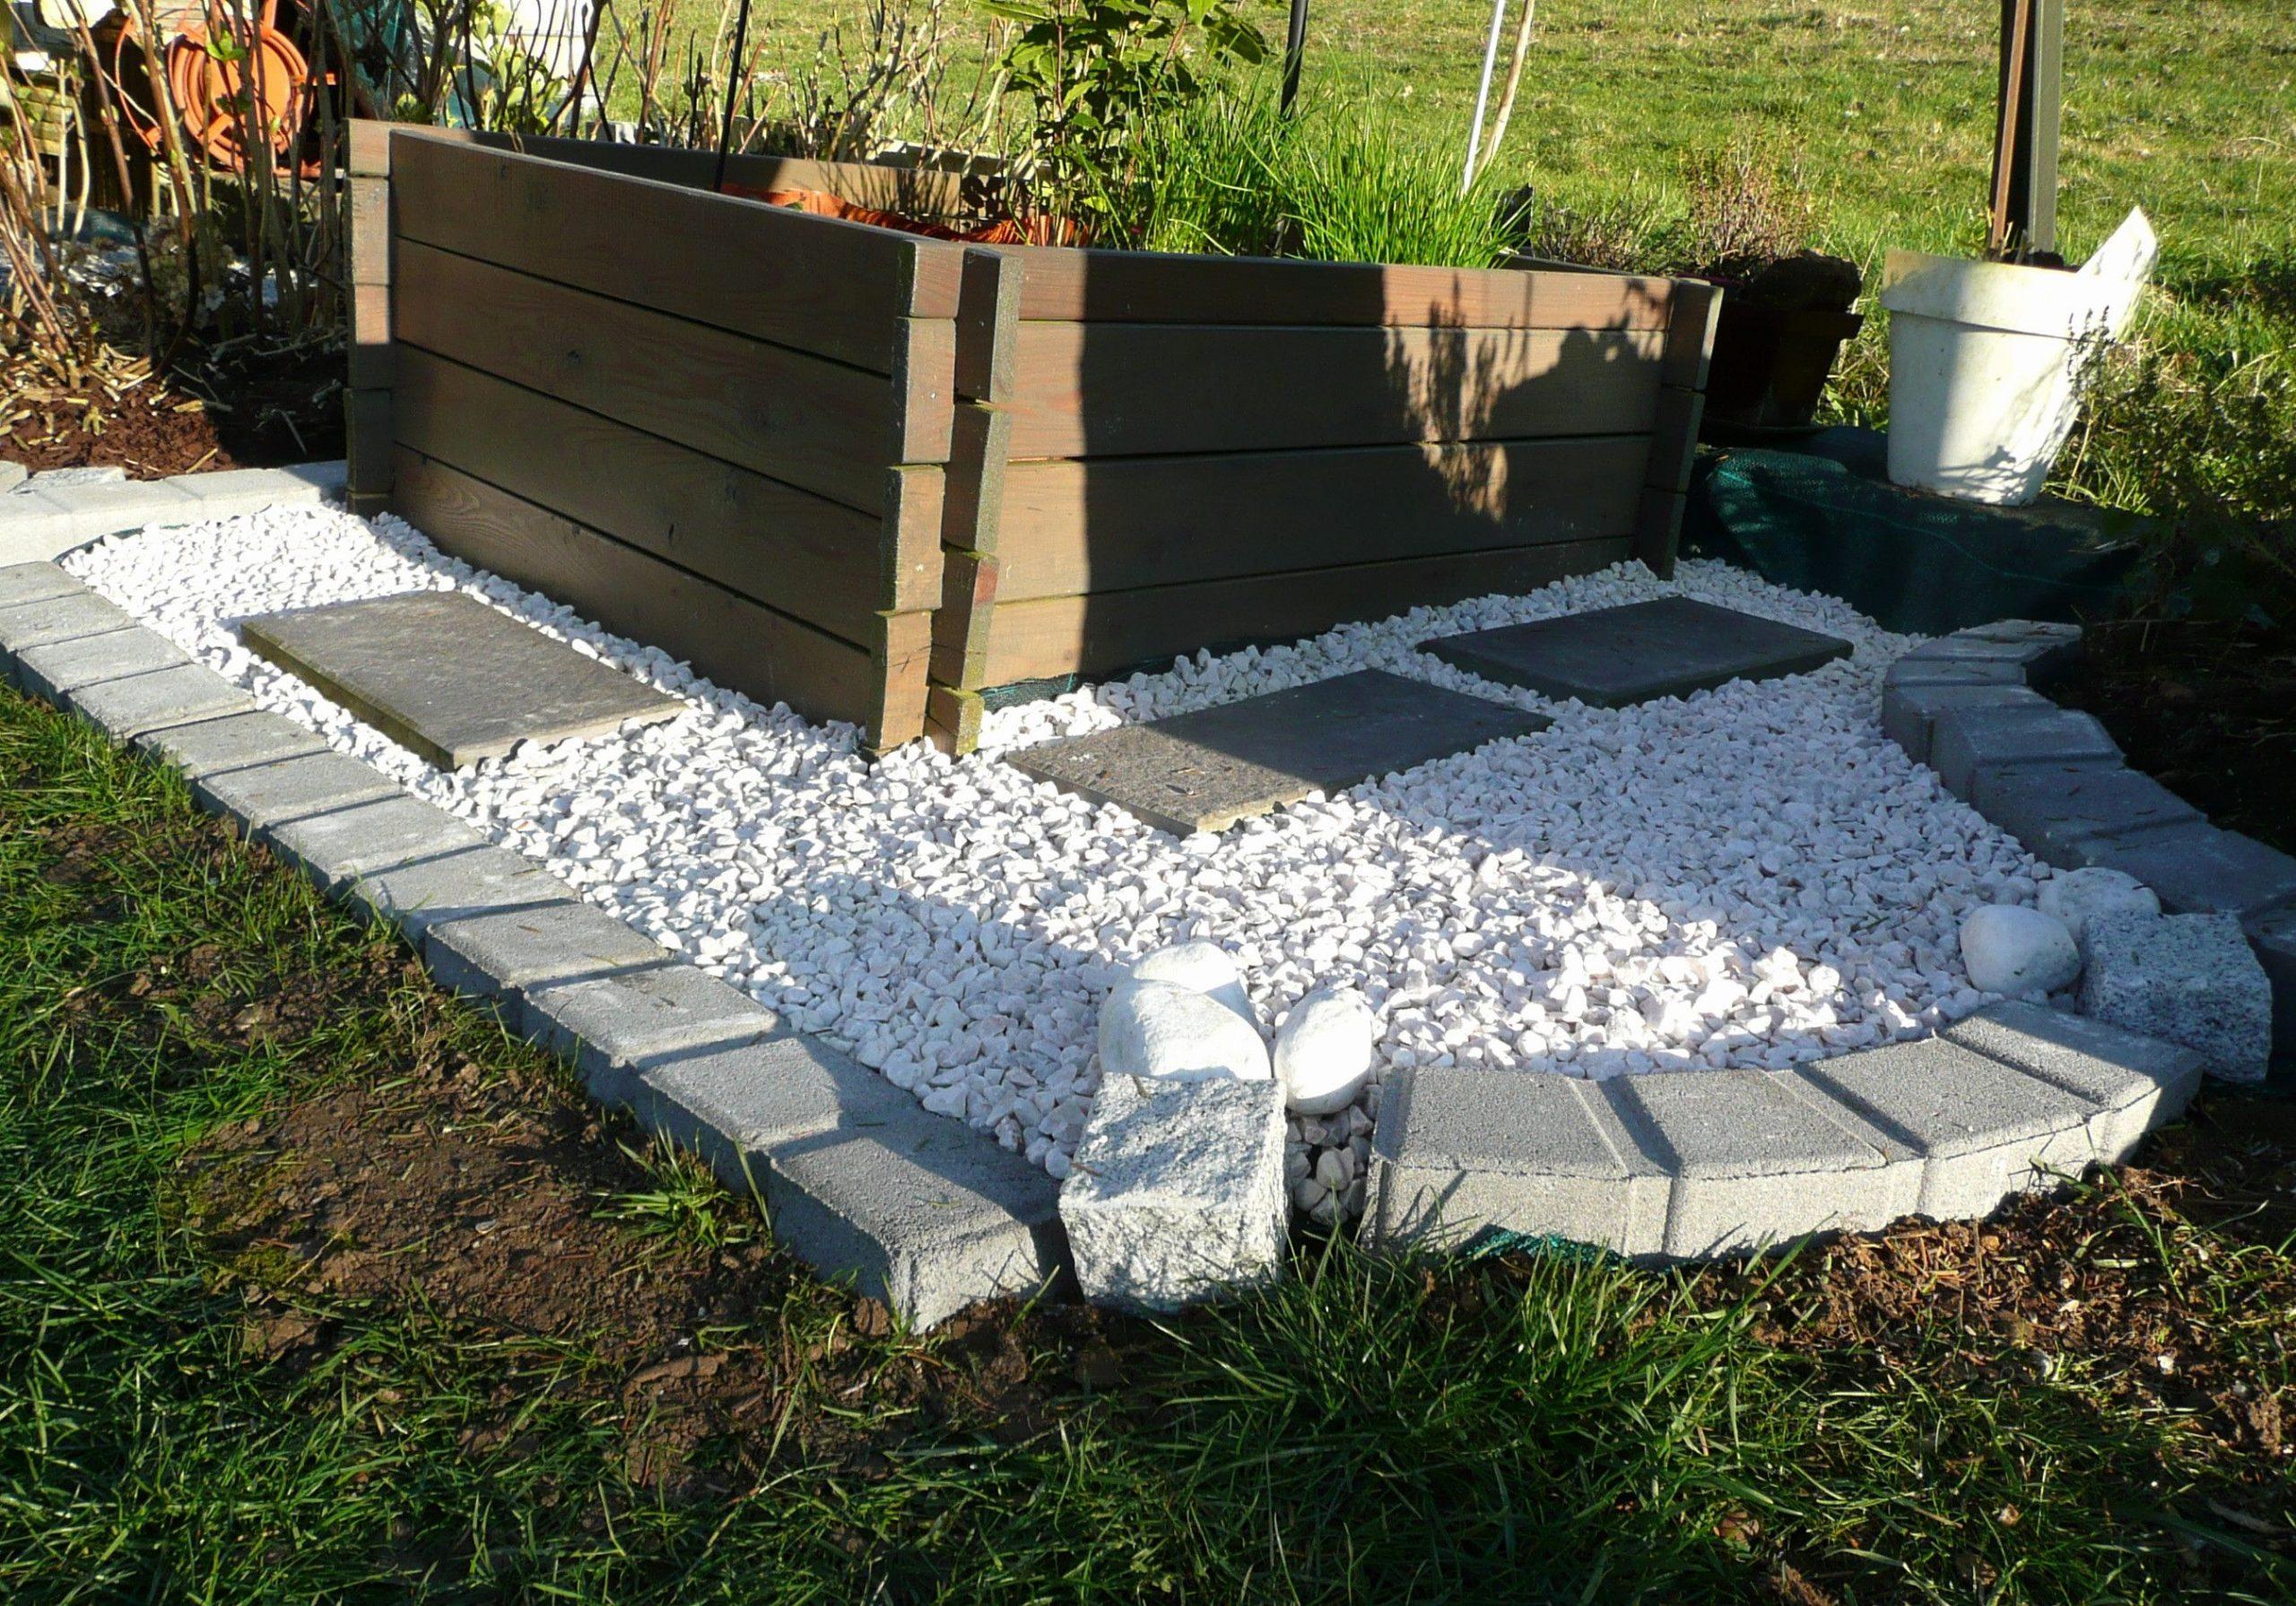 Cailloux Blanc Jardin Fresh Amenagement Jardin Avec Gravier ... tout Idee Deco Jardin Gravier